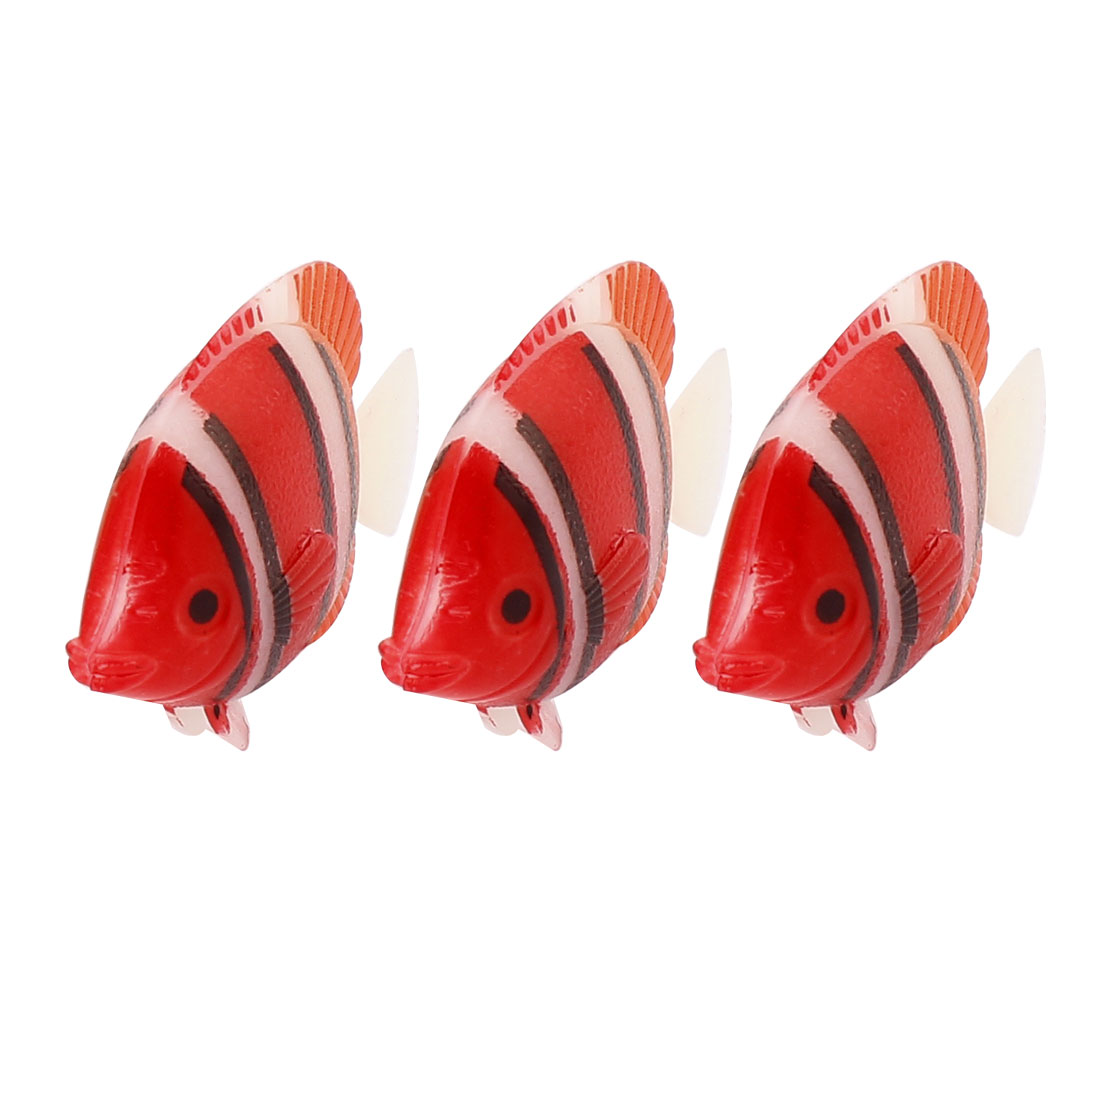 3Pcs Red Aquarium Plastic Floating Swing Tail Tropical Fish Ornament